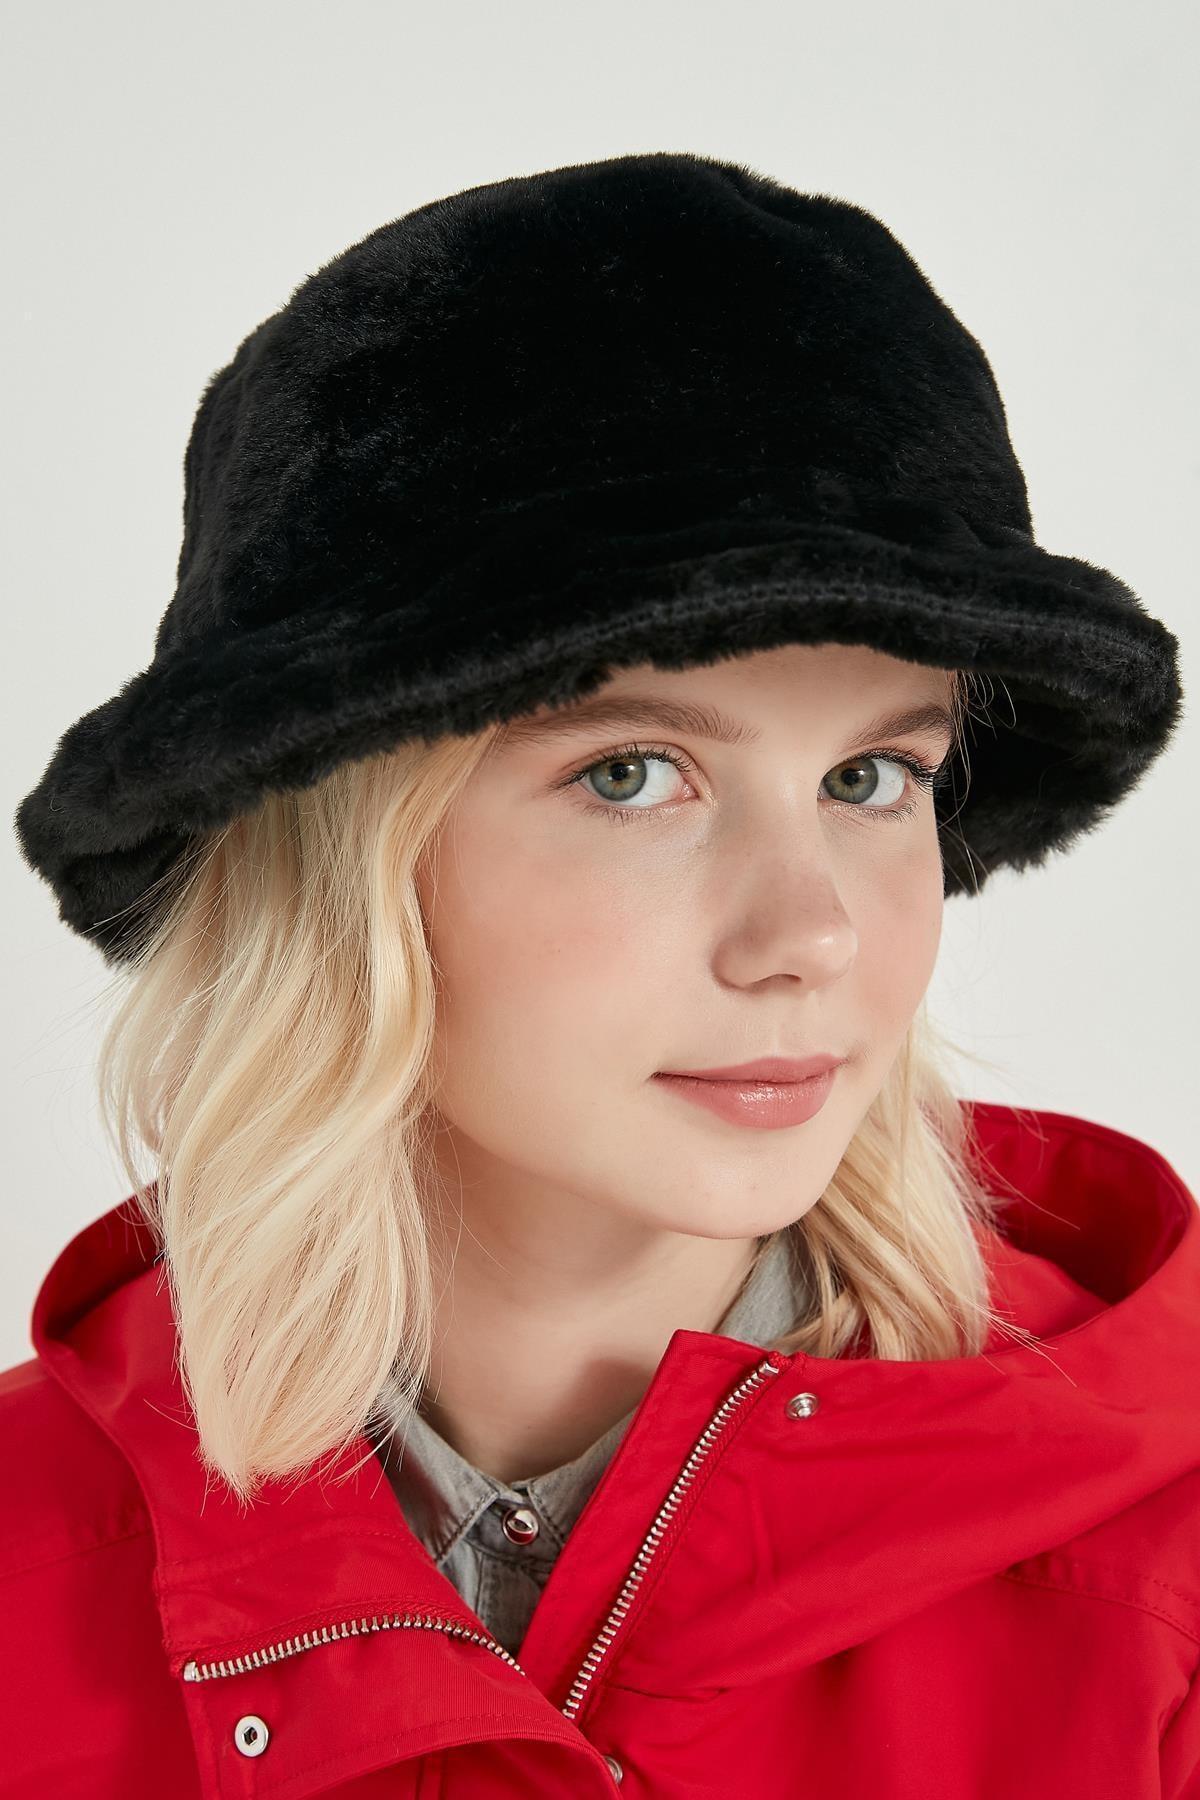 Axesoire 12839-1 Siyah Renk Bucket Şapka 2